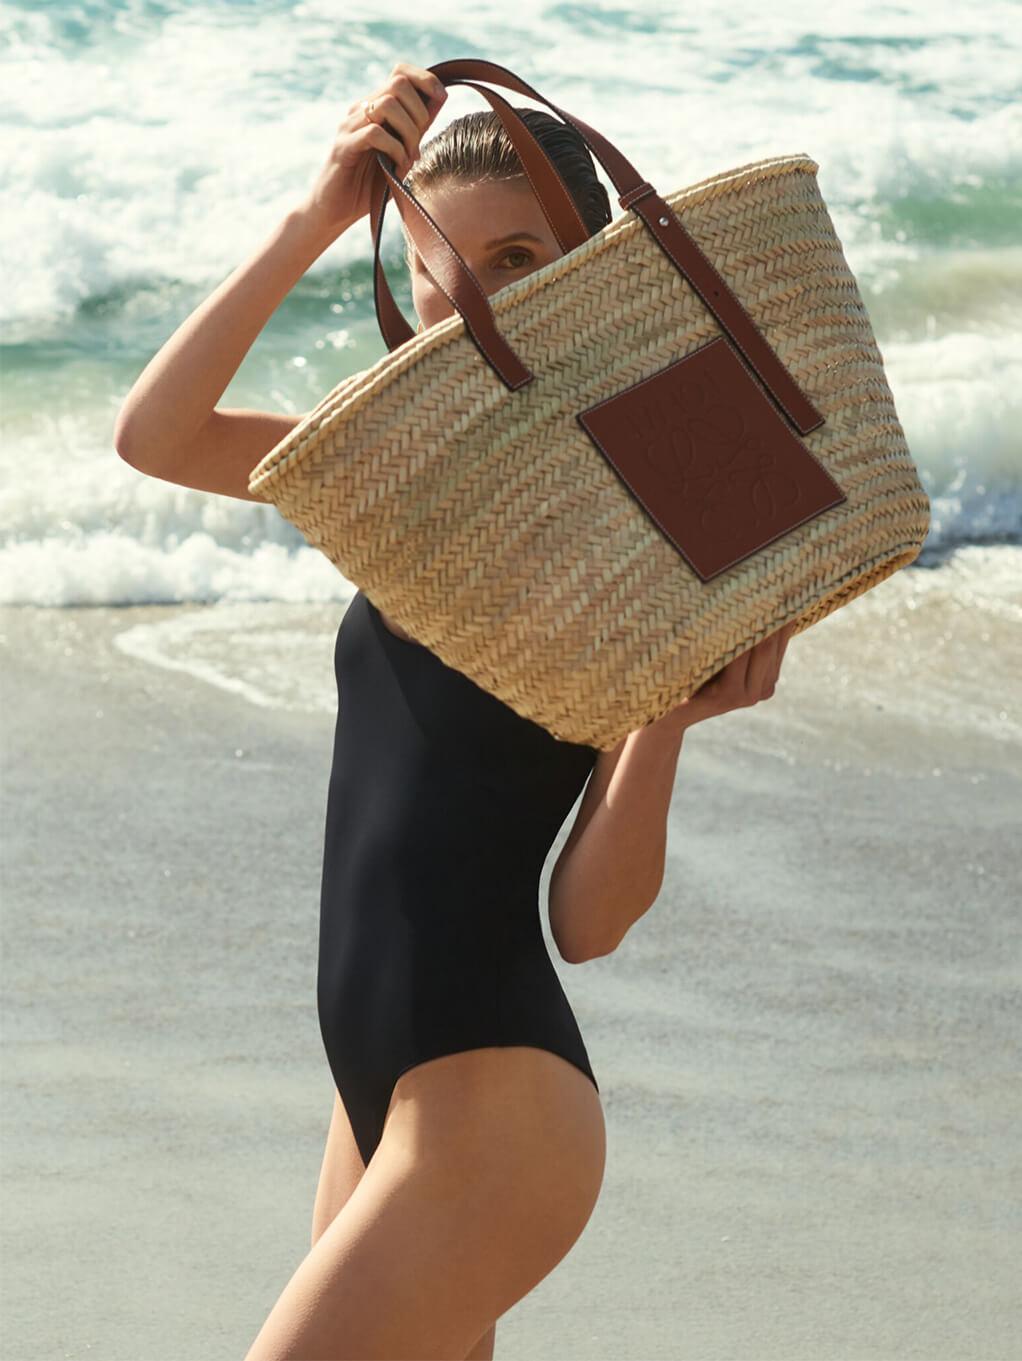 Model with LOEWE Bag